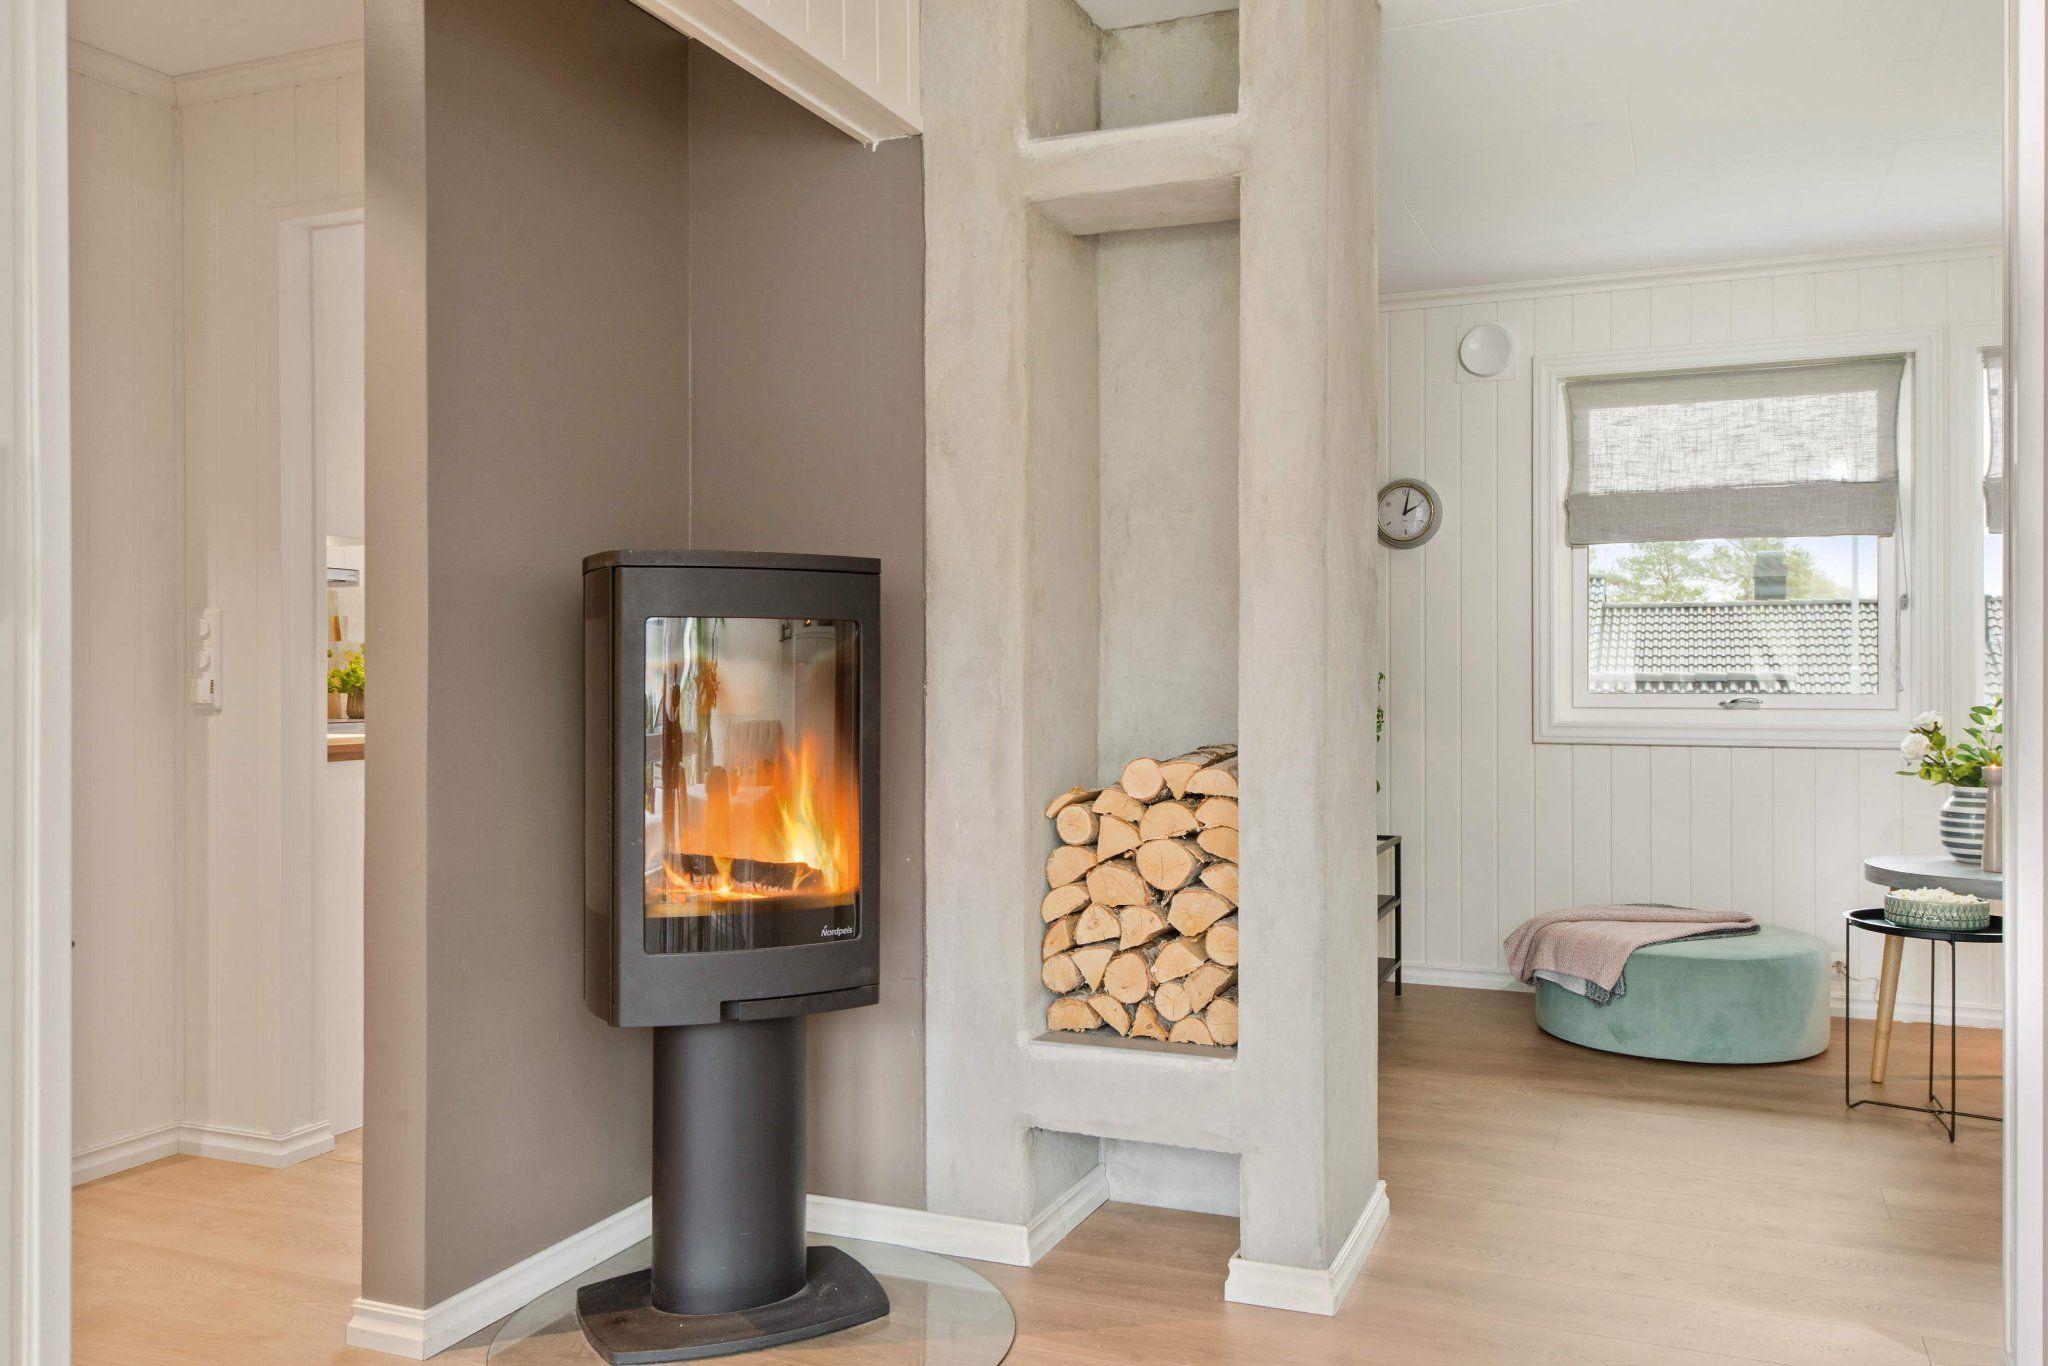 pilot light gas fireplace too high